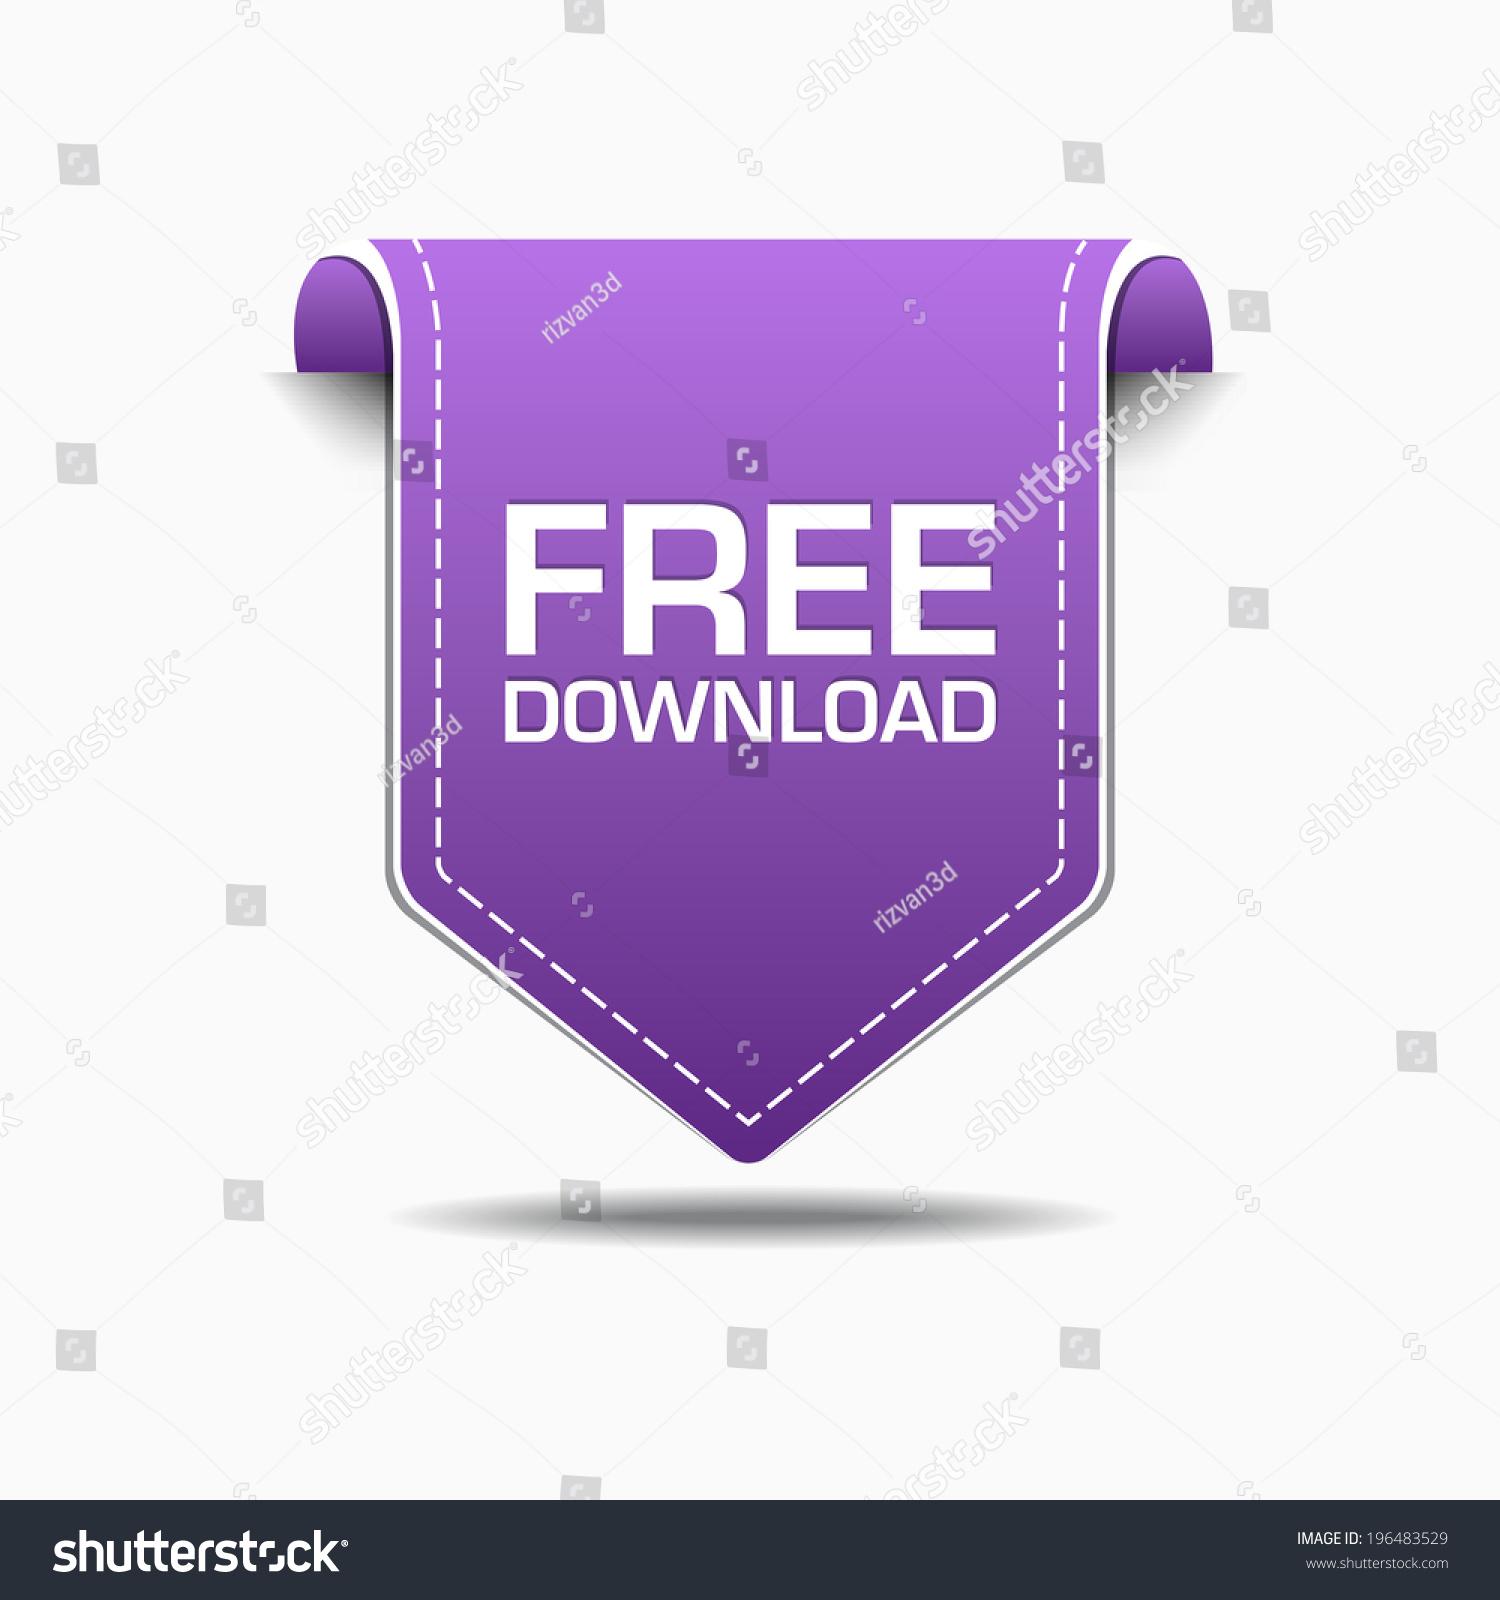 Free Download Purple Label Icon Vector Stock Vector 196483529 ...